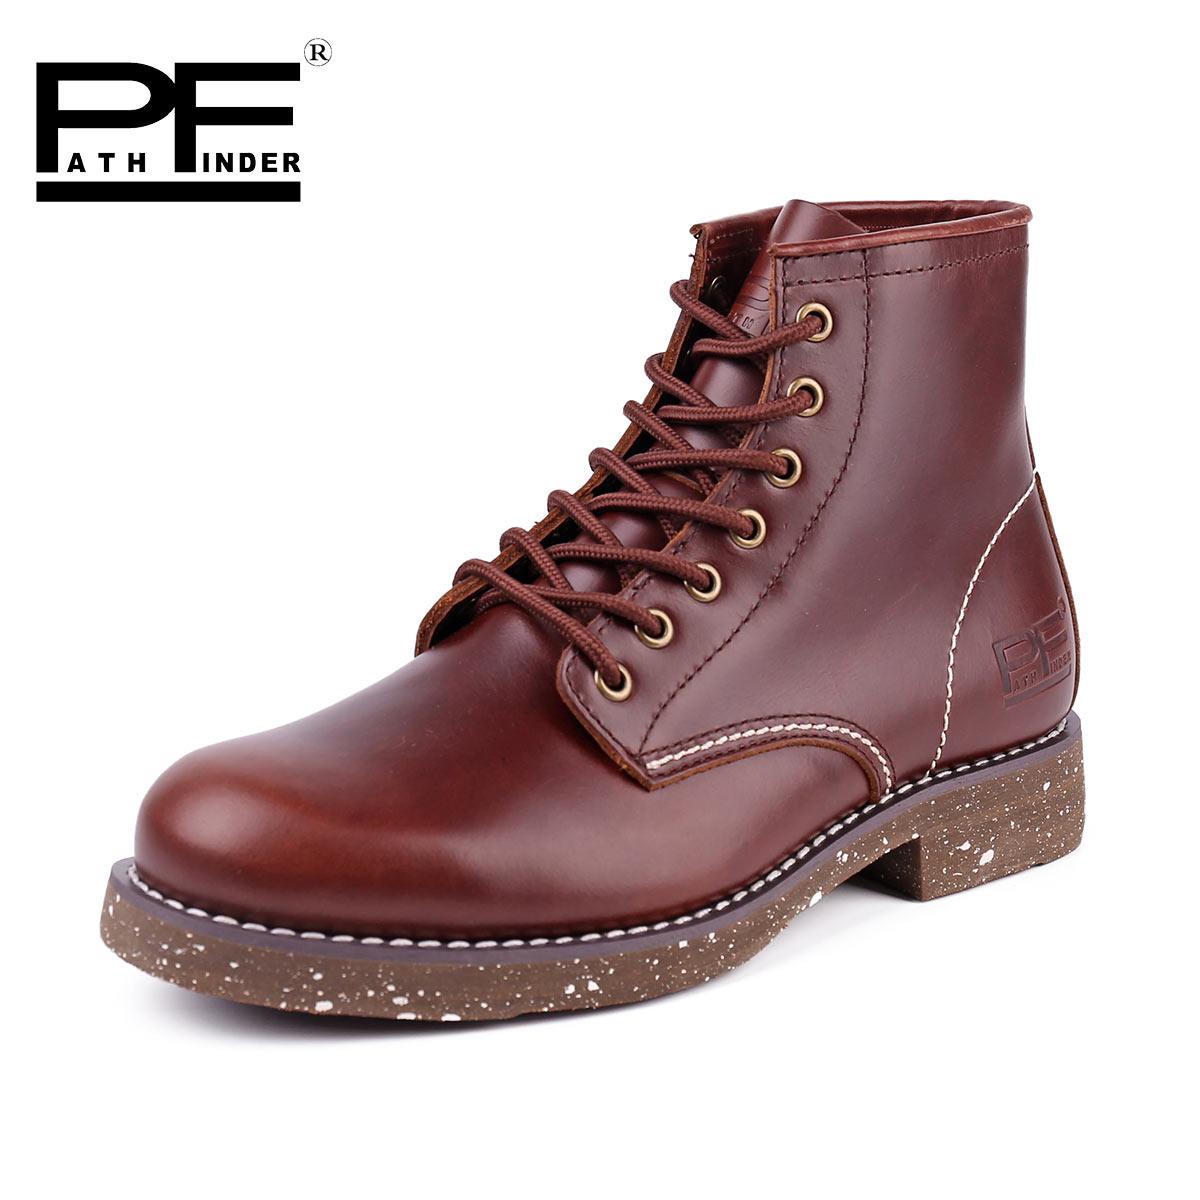 pathfinderPF短筒工装靴伞兵军靴男8111 喷墨潮流真皮户外马丁靴